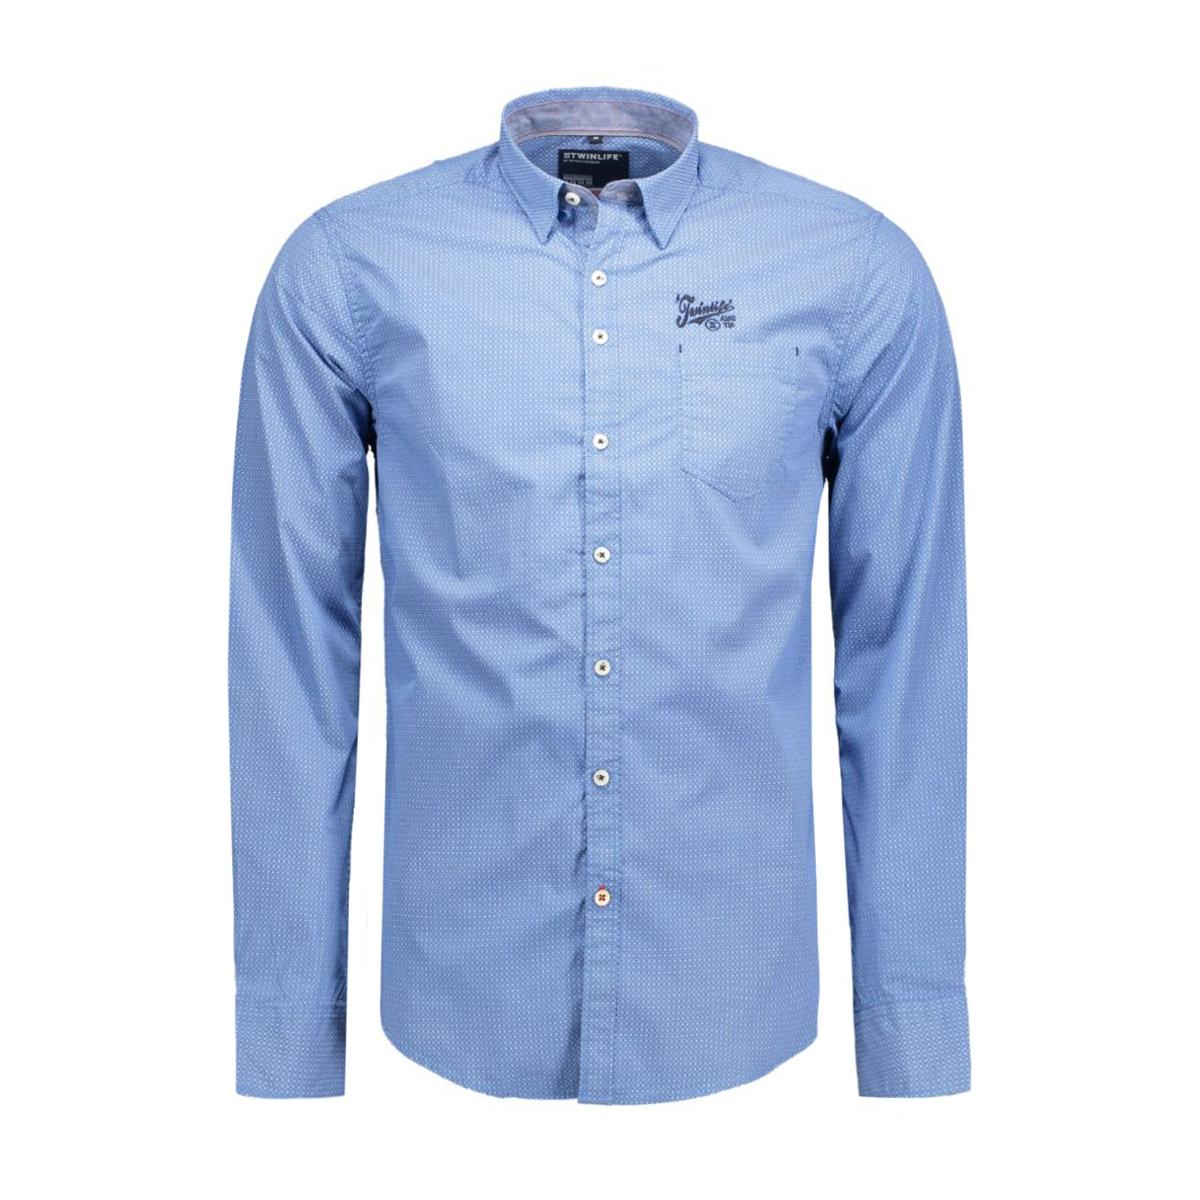 msh621617 twinlife overhemd 6553